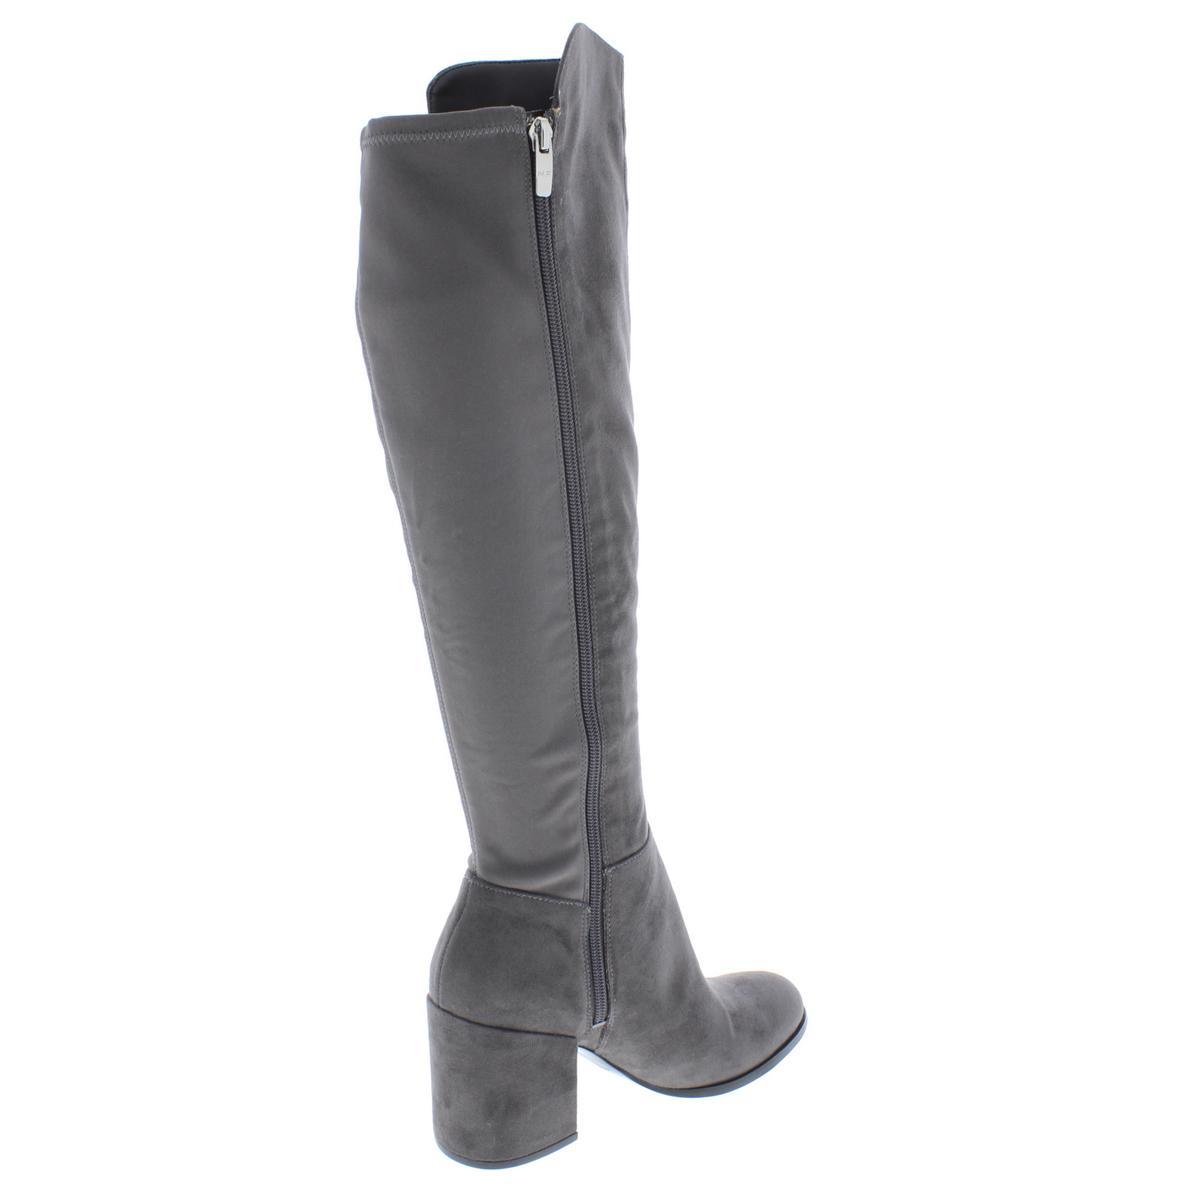 Marc Fisher para mujer lacole Imitación Gamuza Gamuza Gamuza Sobre la Rodilla Botas Zapatos BHFO 5645 42d153